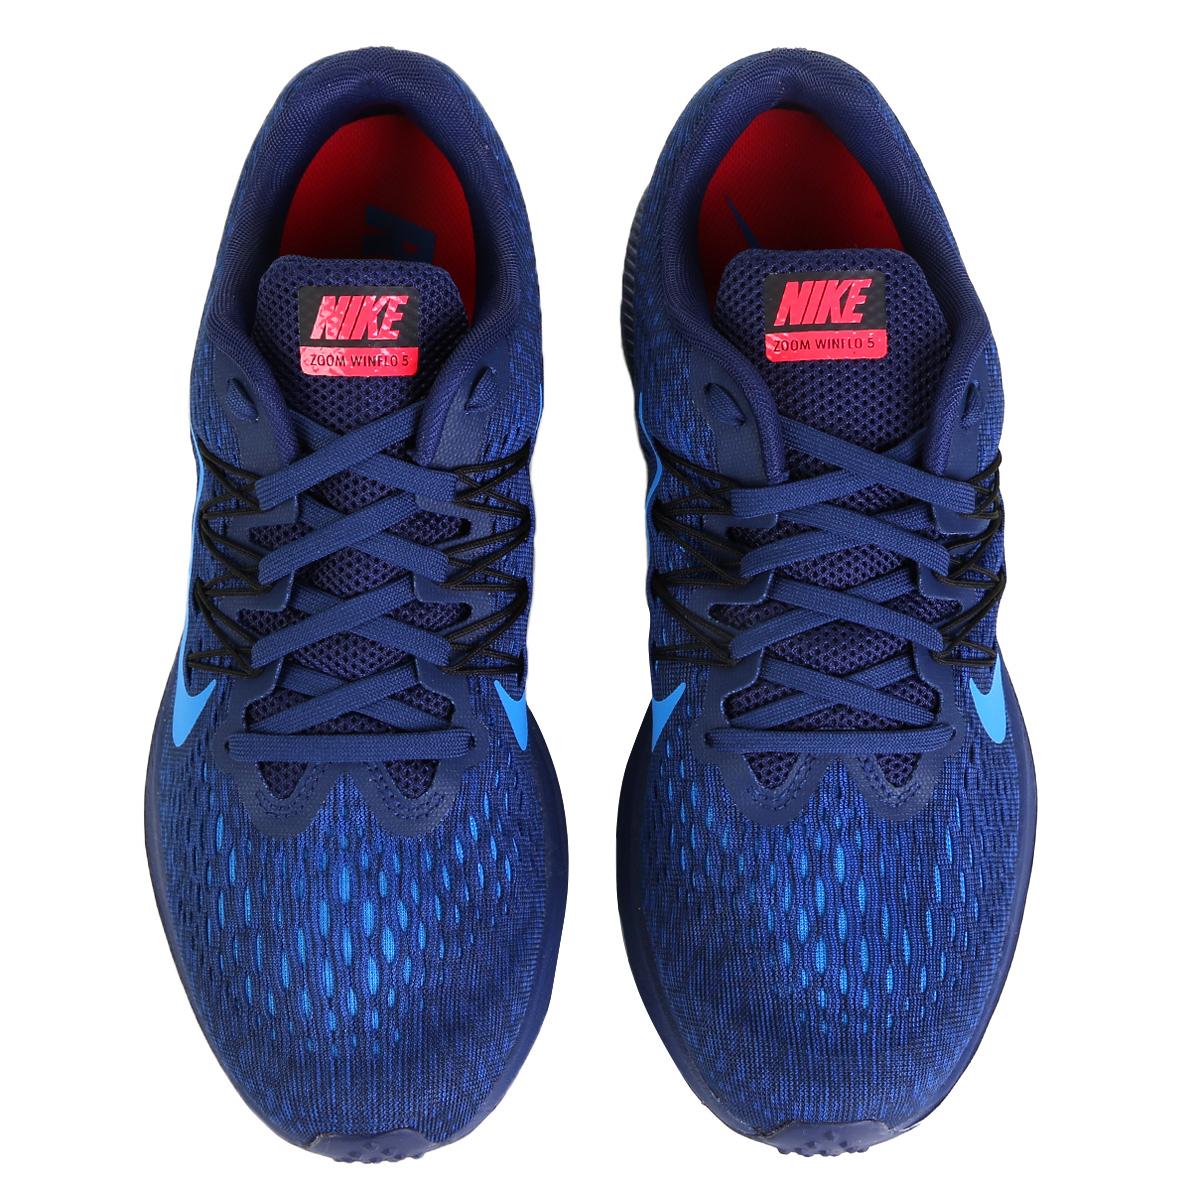 b759fd2b02f Tênis Nike Zoom Winflo 5 Masculino Azul - Compre Agora